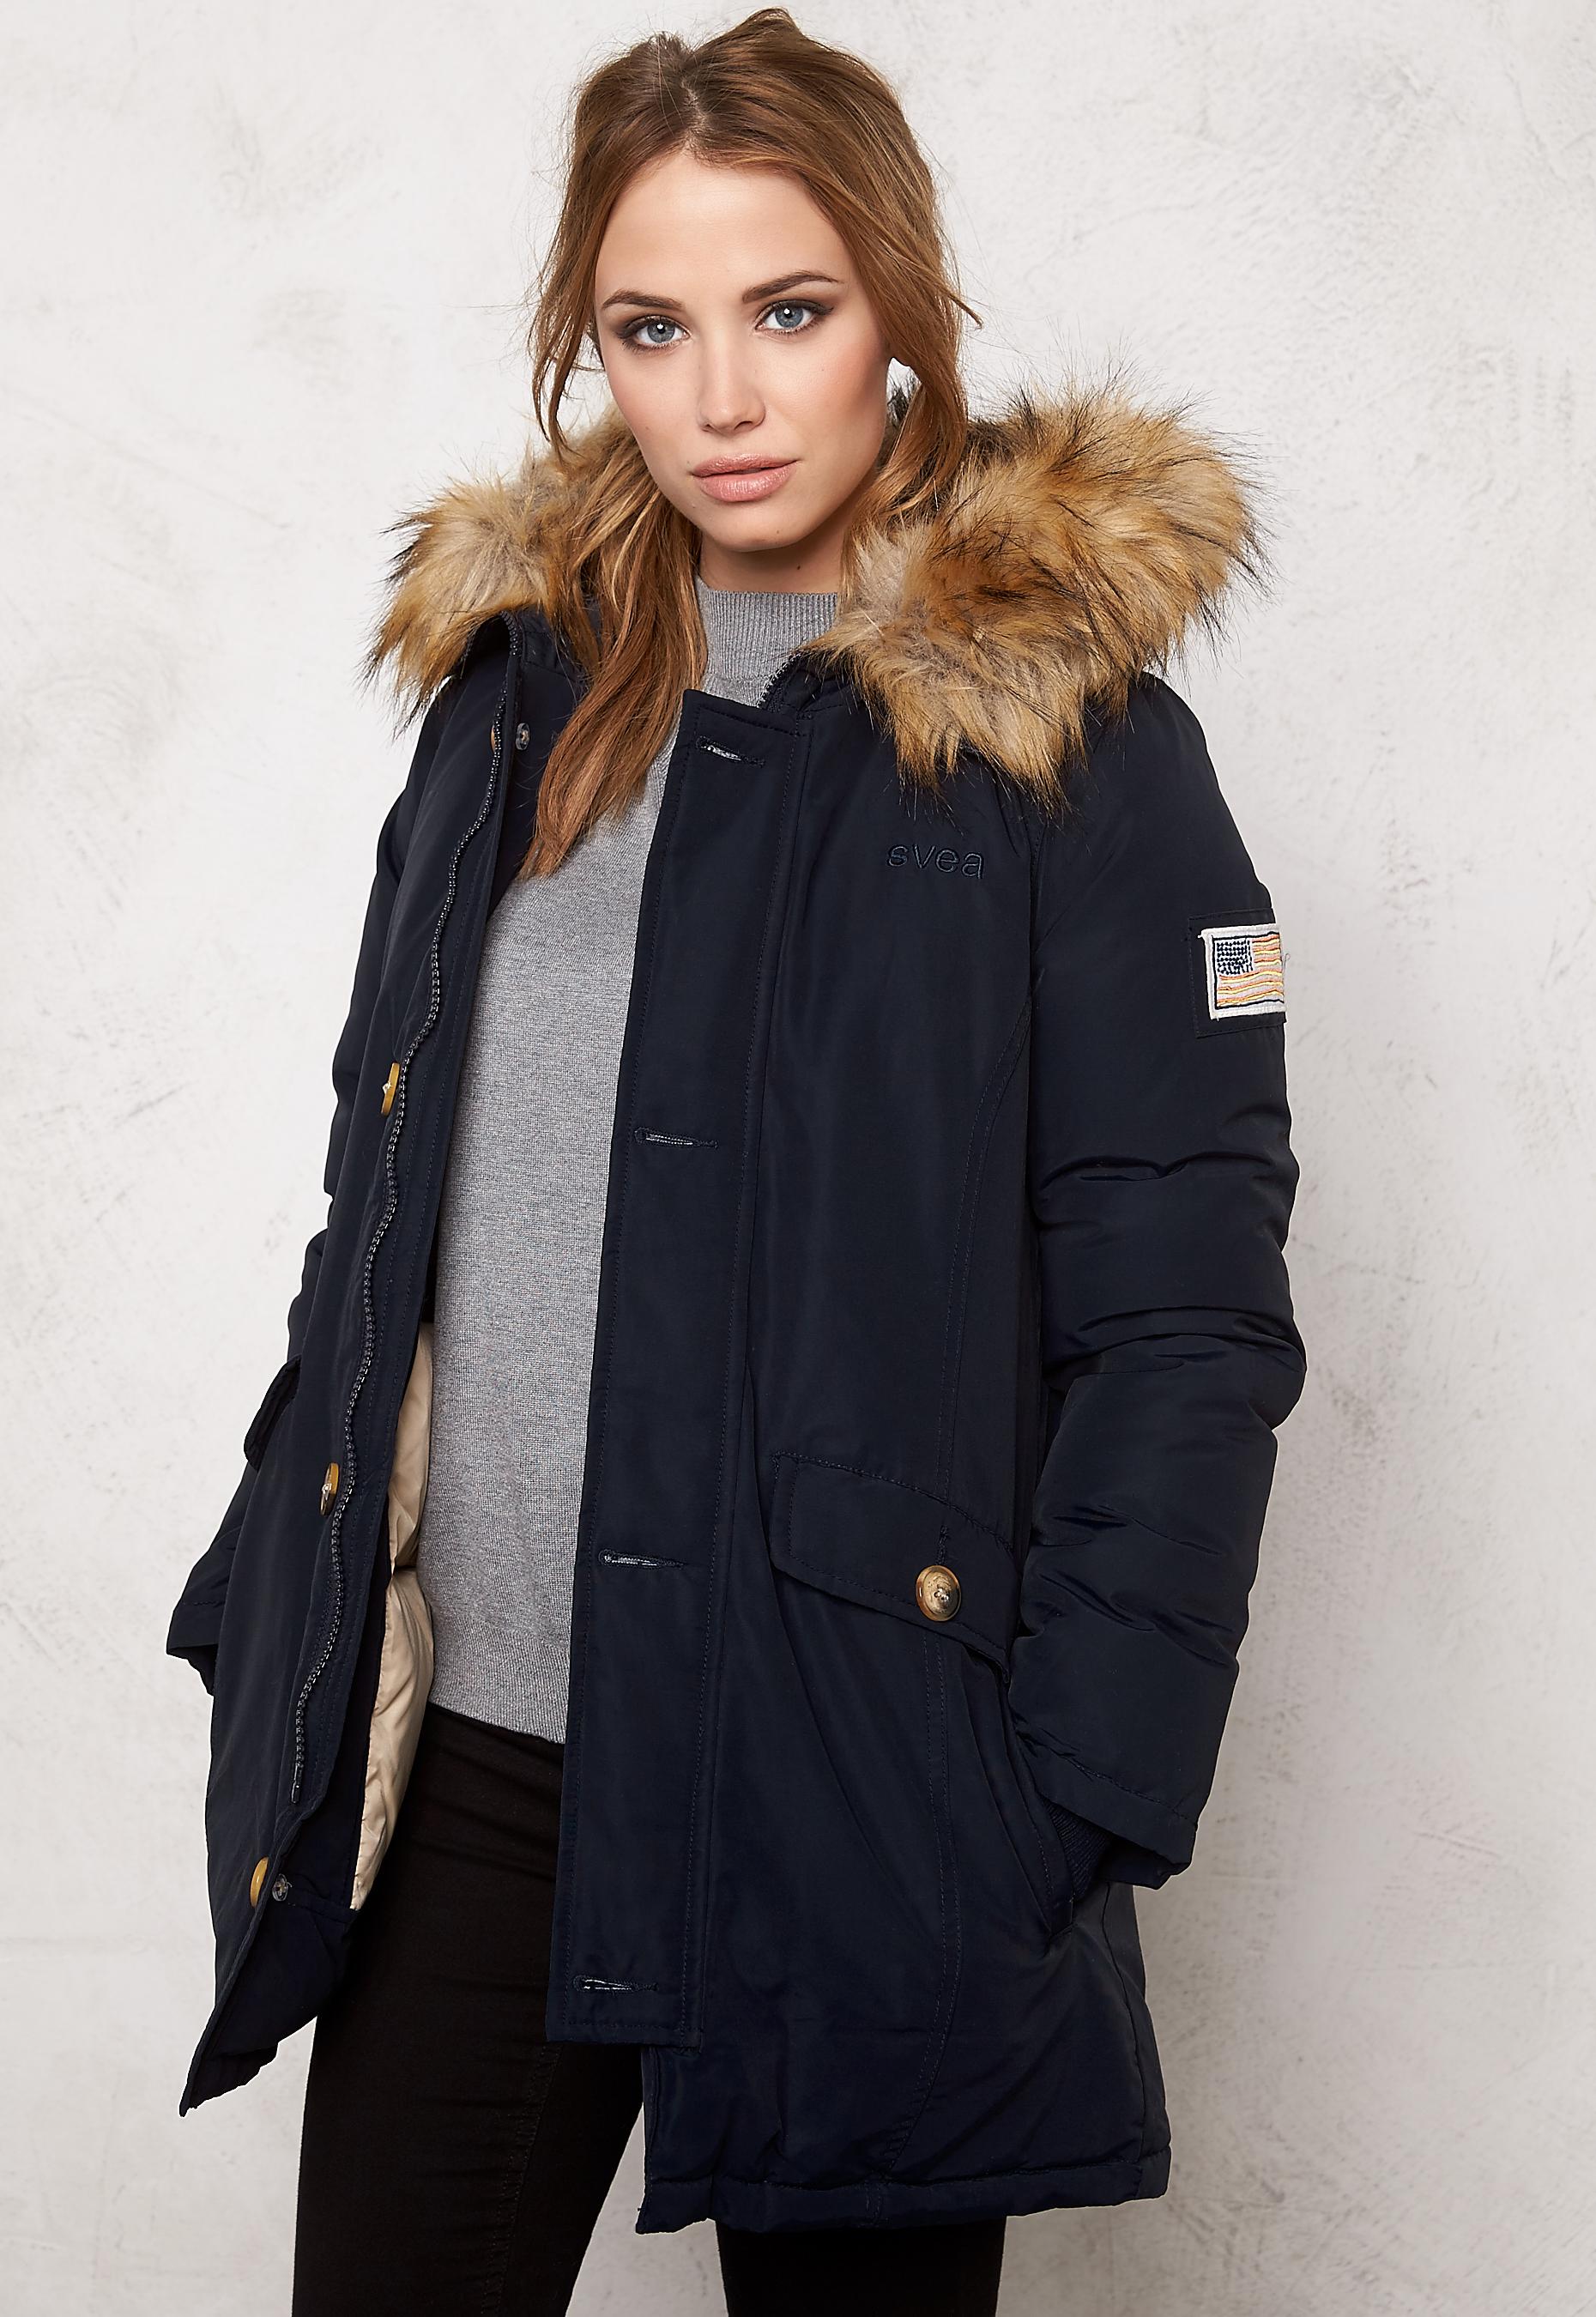 Svea Miss Smith Jacket Navy | GetInspired.no